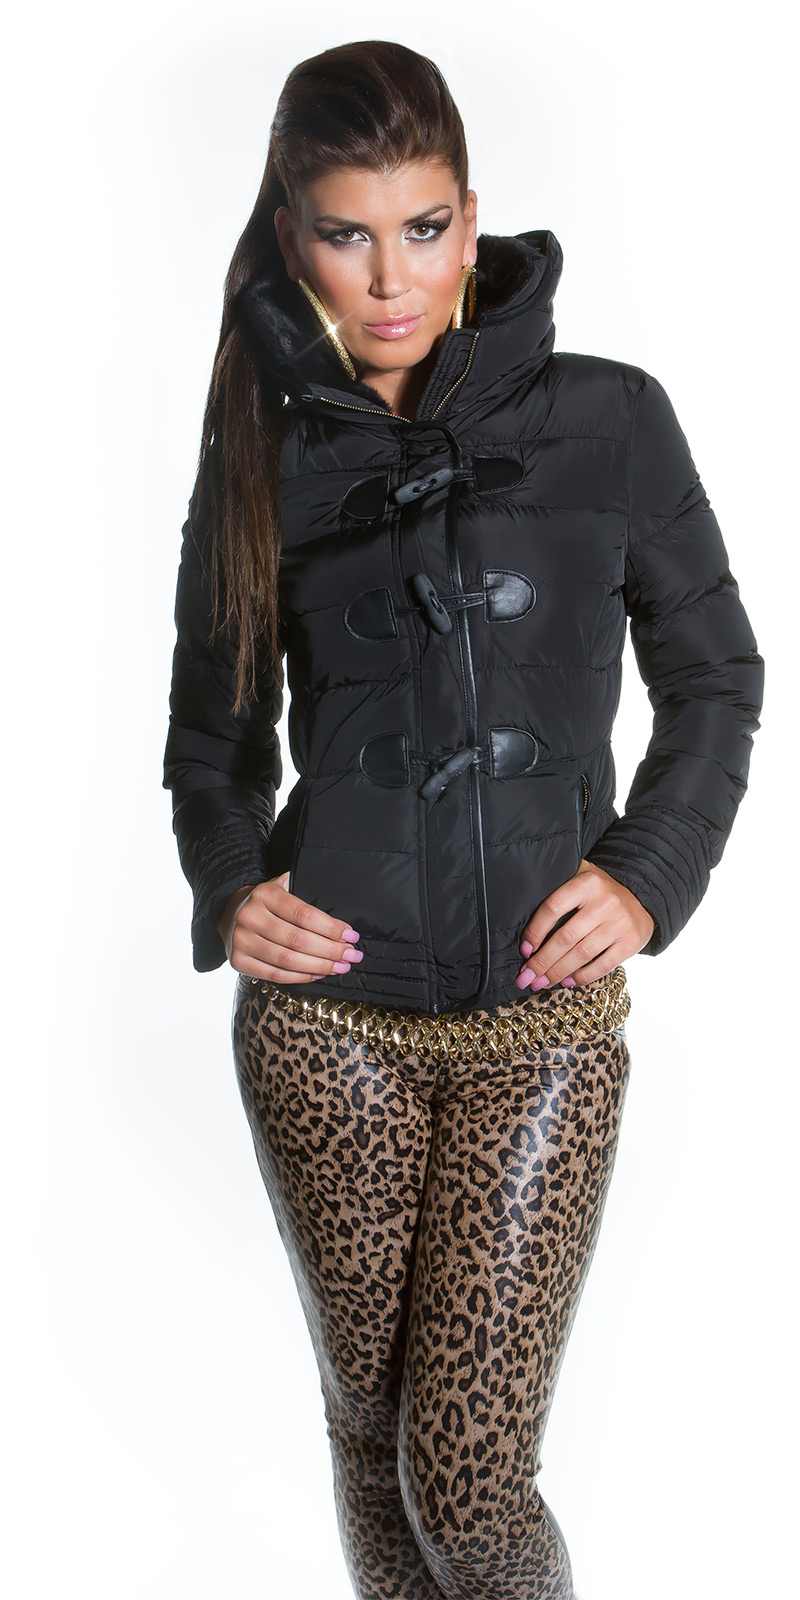 koucla damen jacke steppjacke jacket daunen look fake fur fellkragen kapuze sw ebay. Black Bedroom Furniture Sets. Home Design Ideas